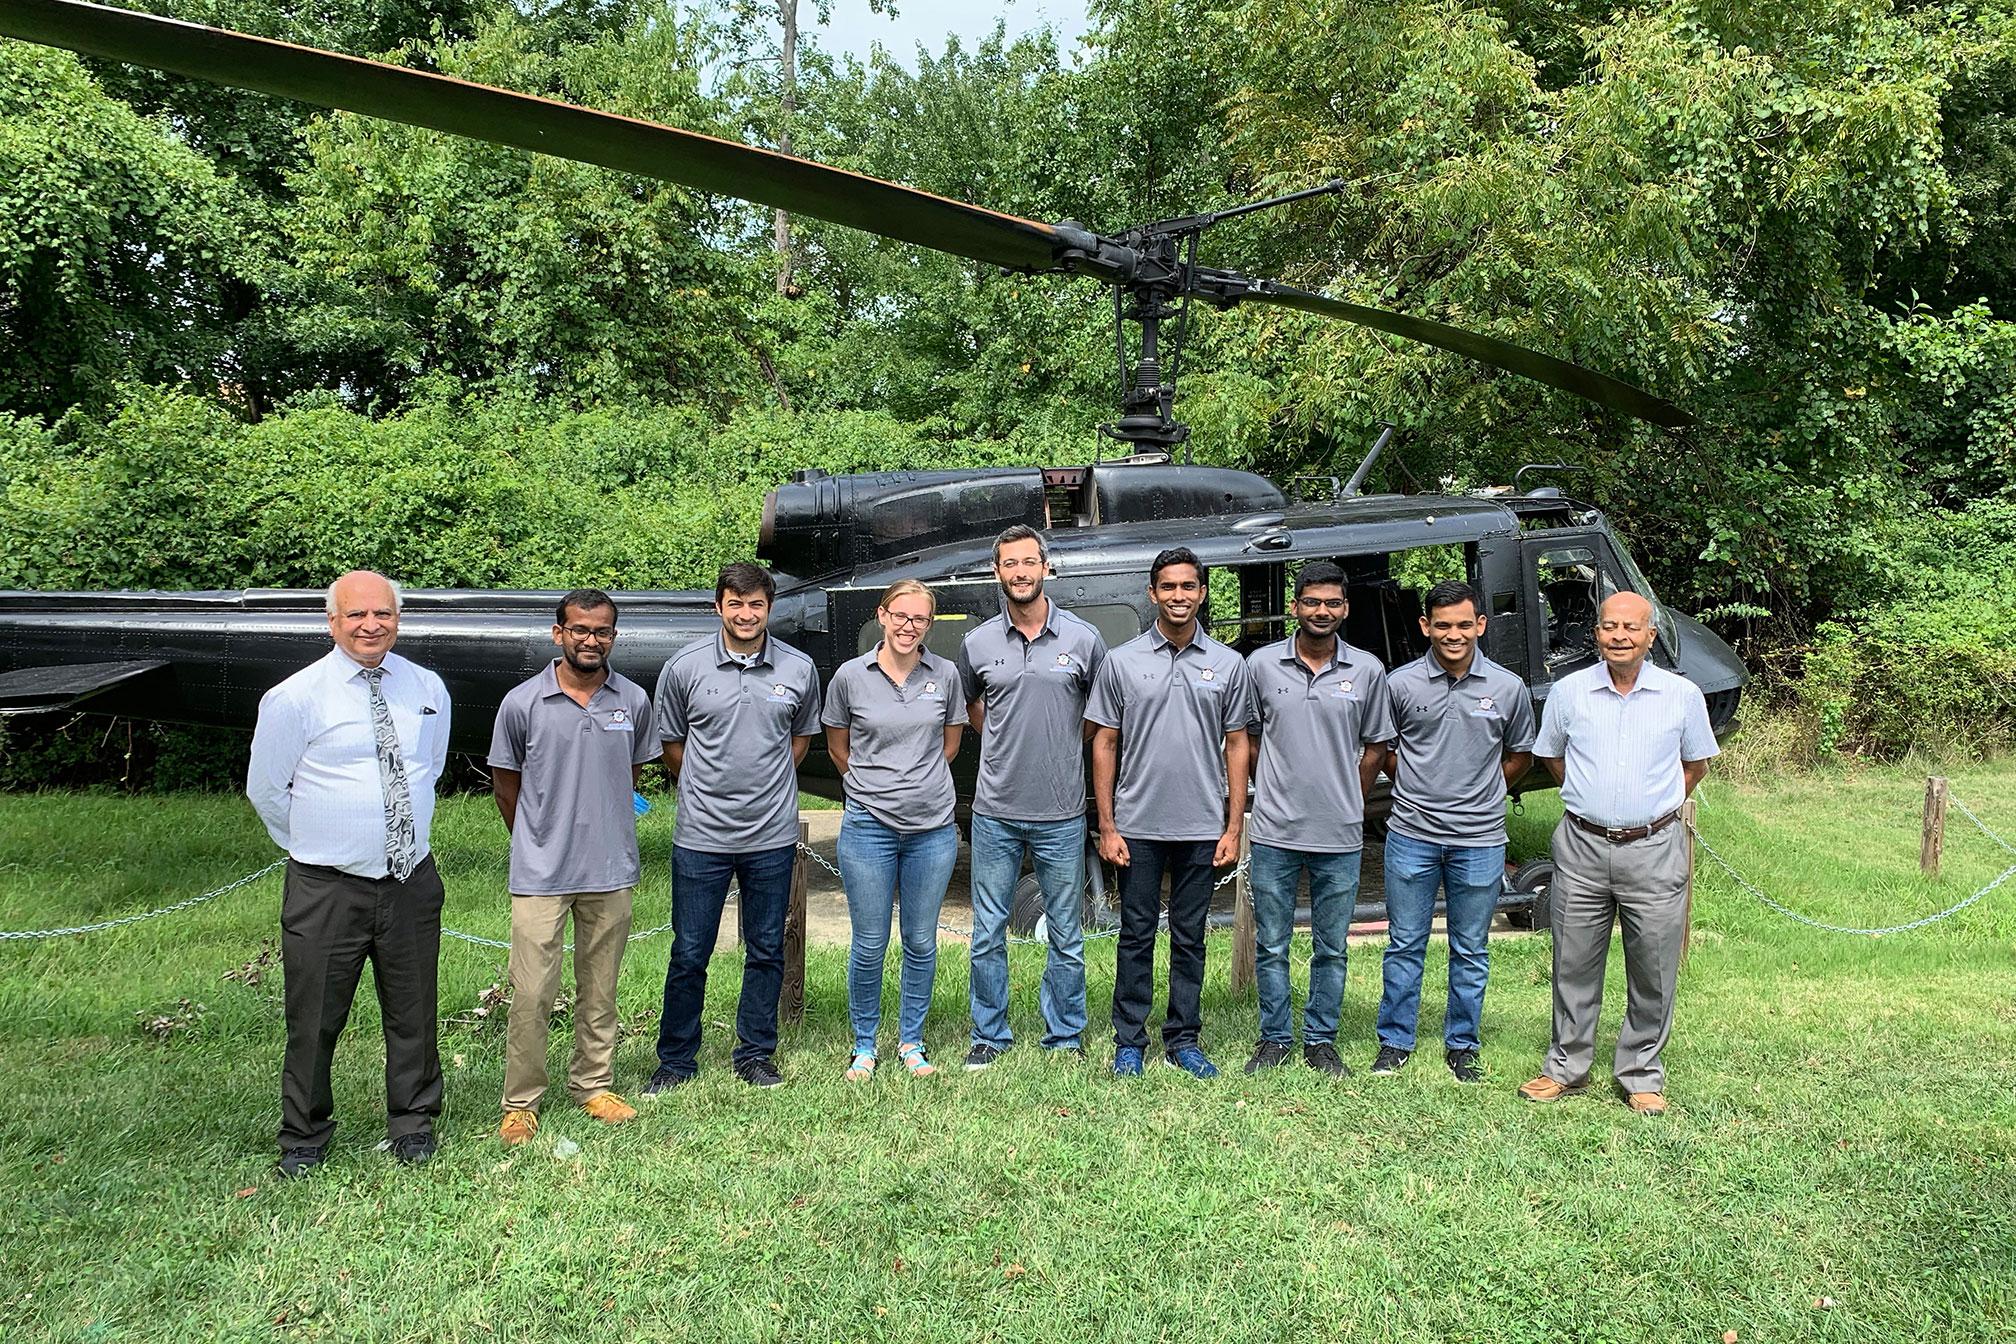 This year's graduate rotorcraft design team (from left to right: Dr. Inderjit Chopra, Abhishek Shastry, Ravi Lumba, Amy Morin, Seyhan Gul, Mrinalgouda Patil, Shashank Maurya, Nishant Nemani, and Dr. Vengalattore Nagaraj)